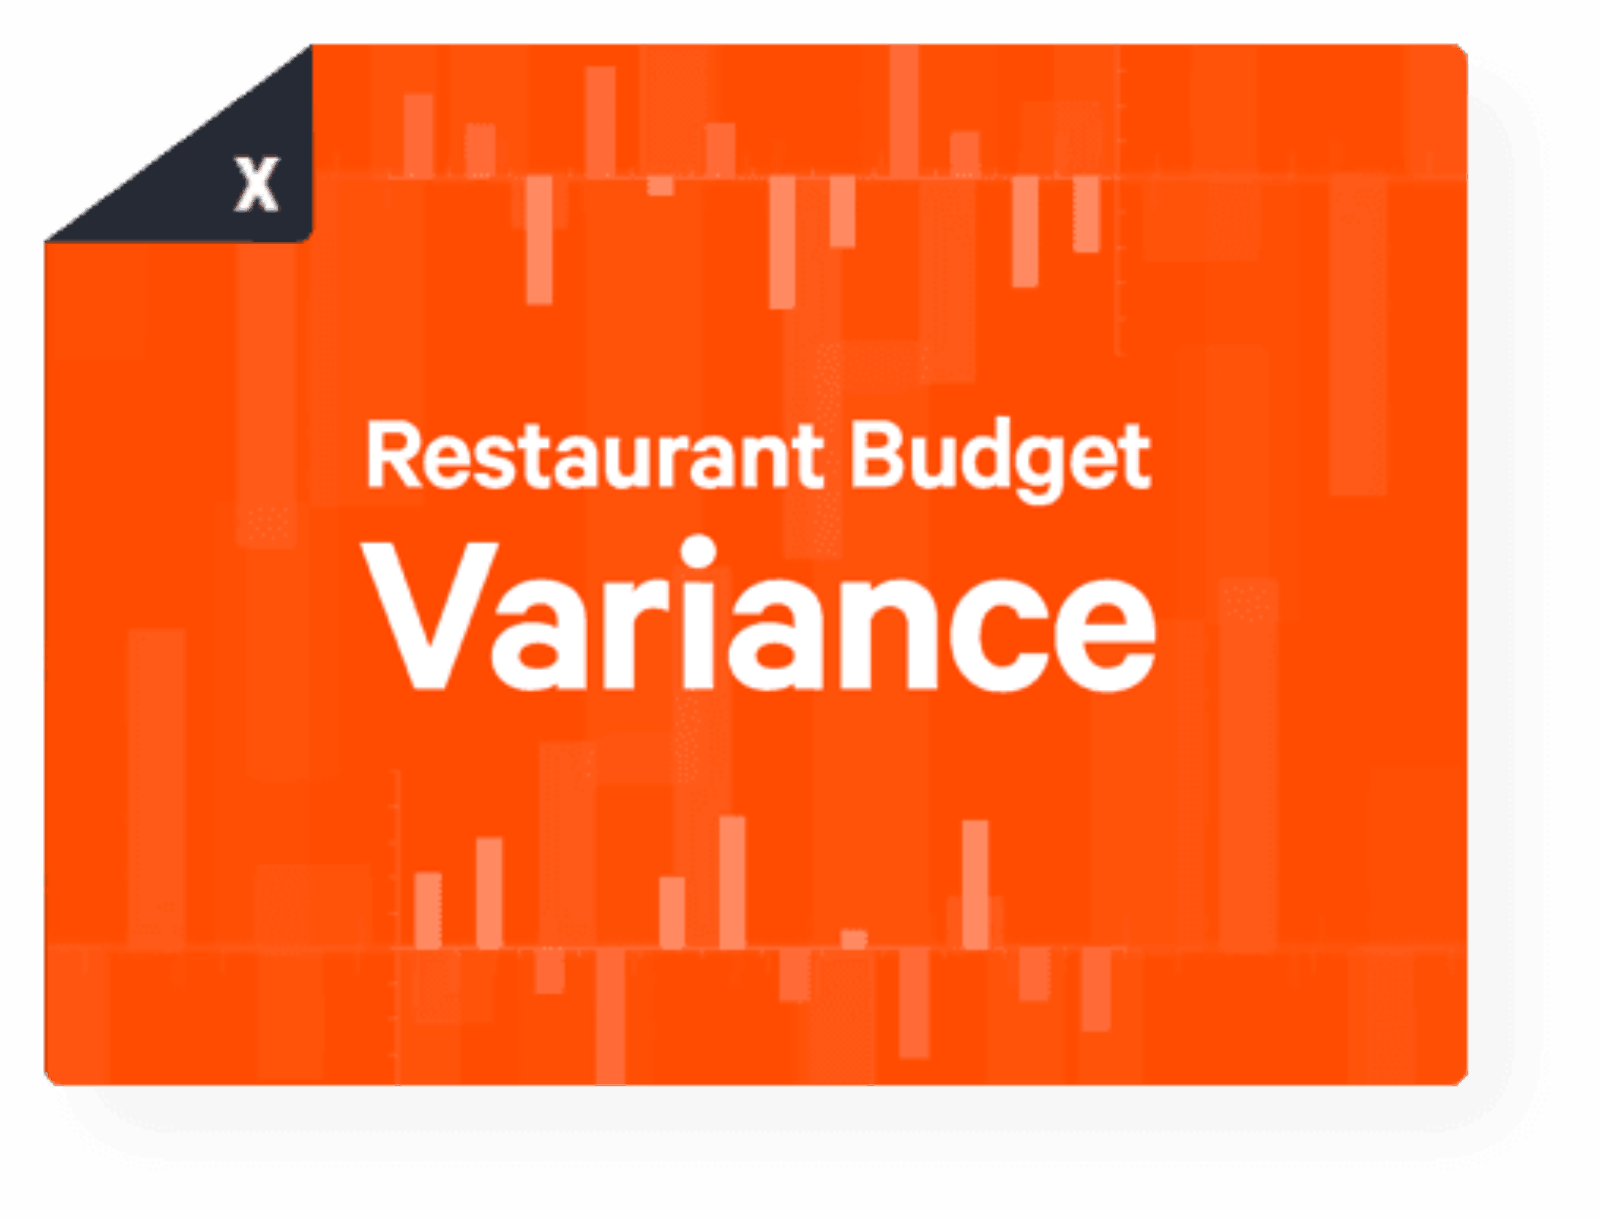 Restaurant Budget 75nb439xc